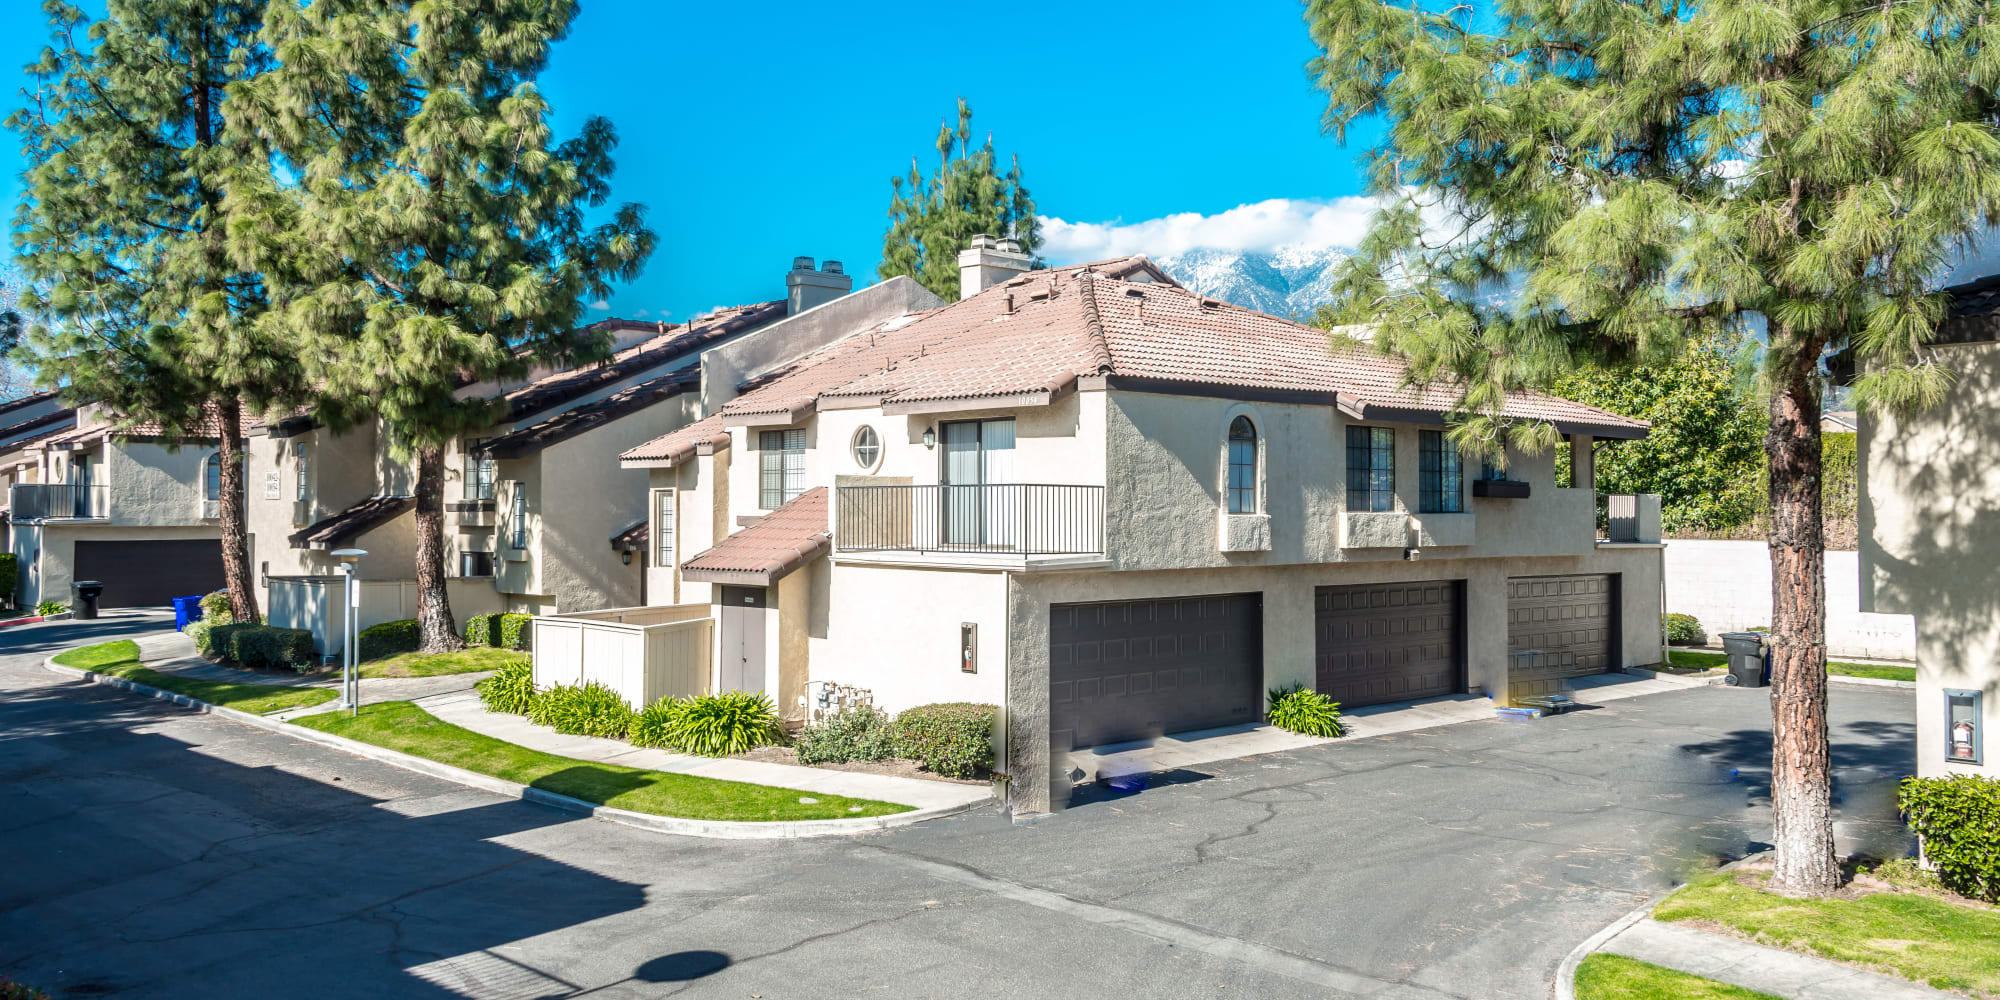 Alta Loma, California, apartments at Sonora at Alta Loma